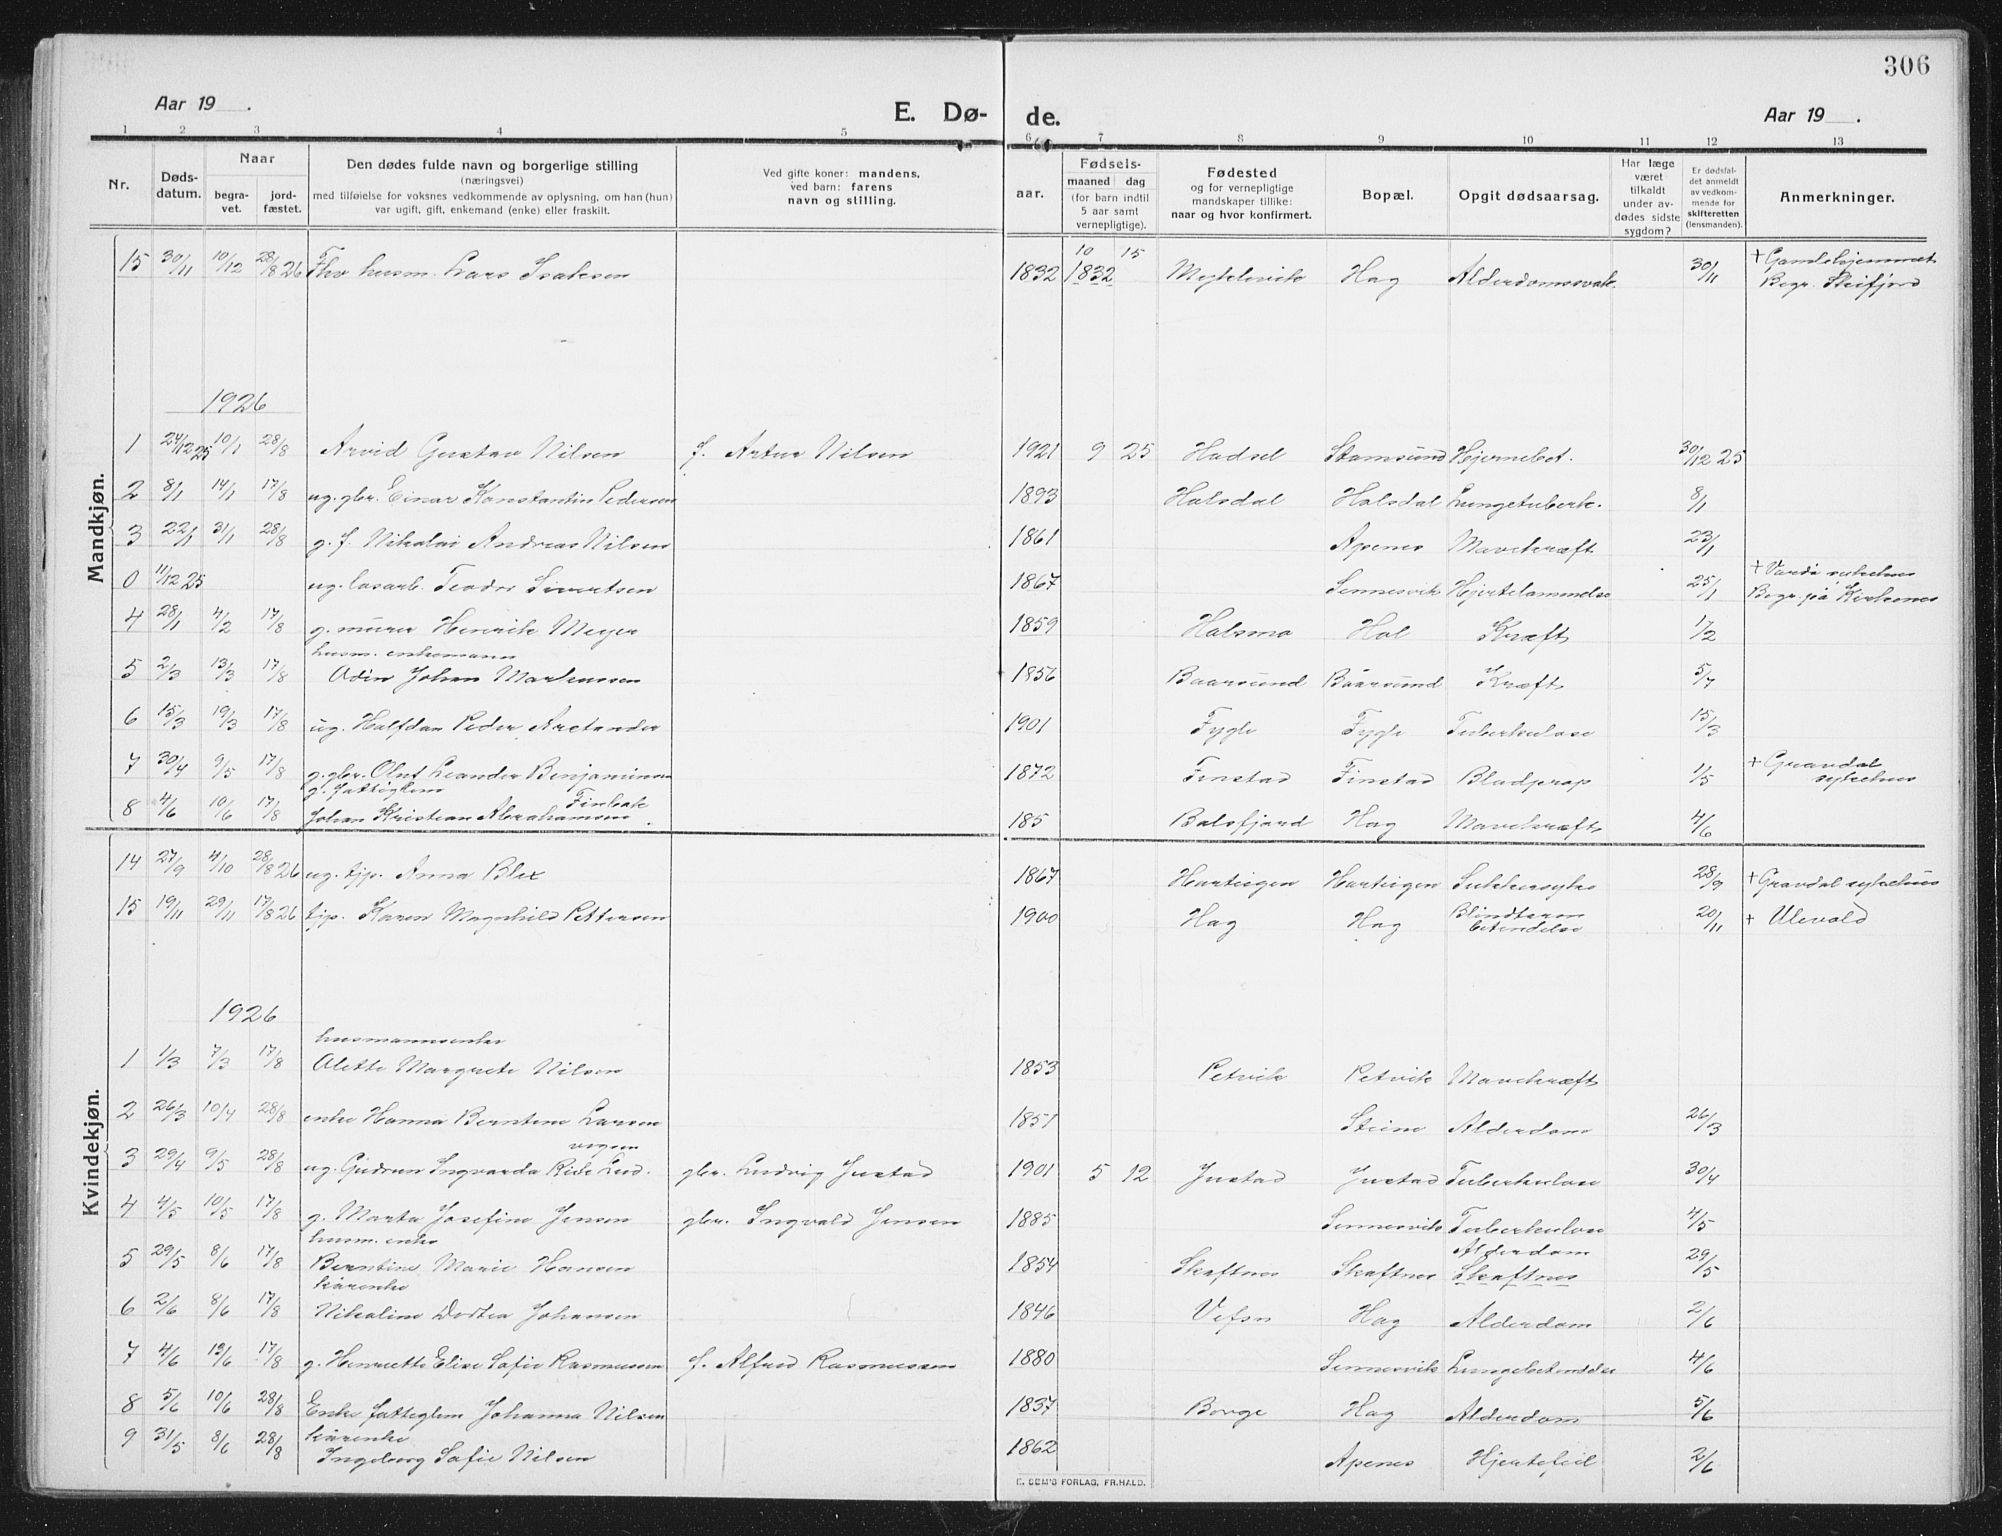 SAT, Ministerialprotokoller, klokkerbøker og fødselsregistre - Nordland, 882/L1183: Klokkerbok nr. 882C01, 1911-1938, s. 306